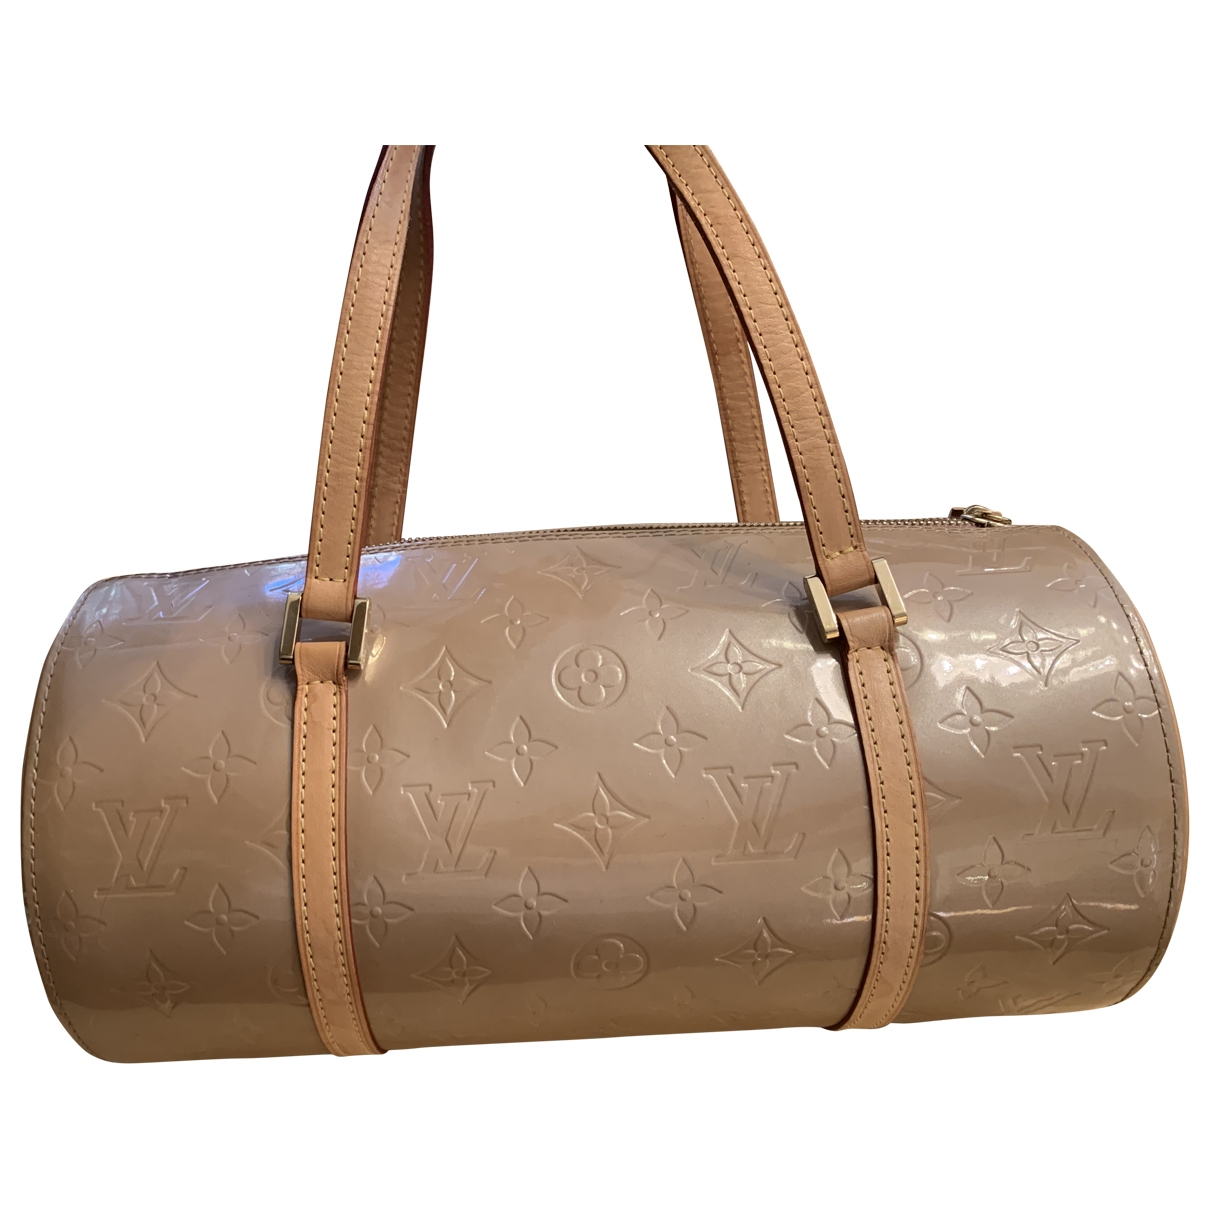 Bolso  Bedford de Charol Louis Vuitton